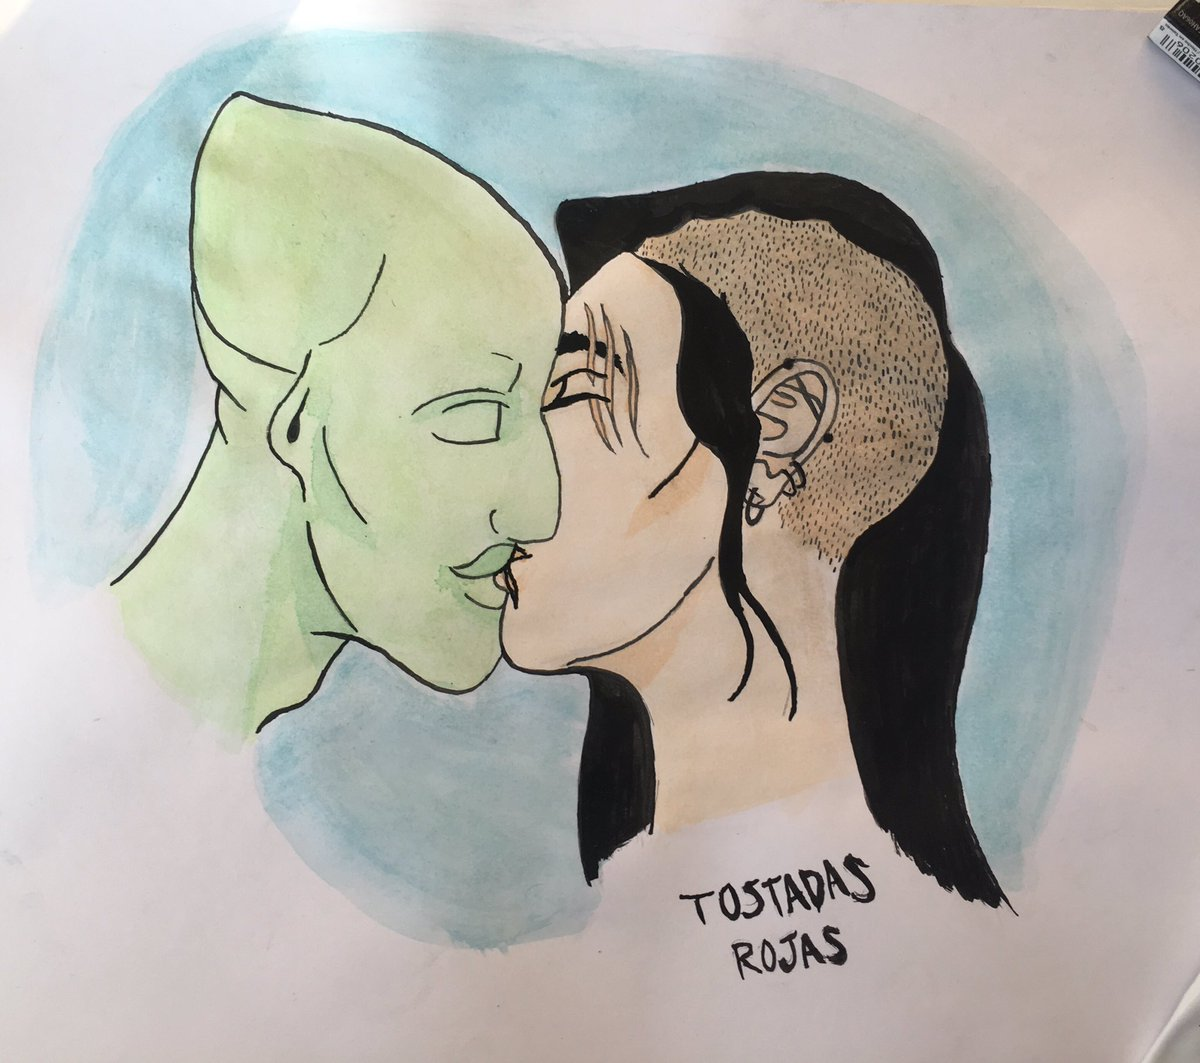 Gratis online dating sites Joodse